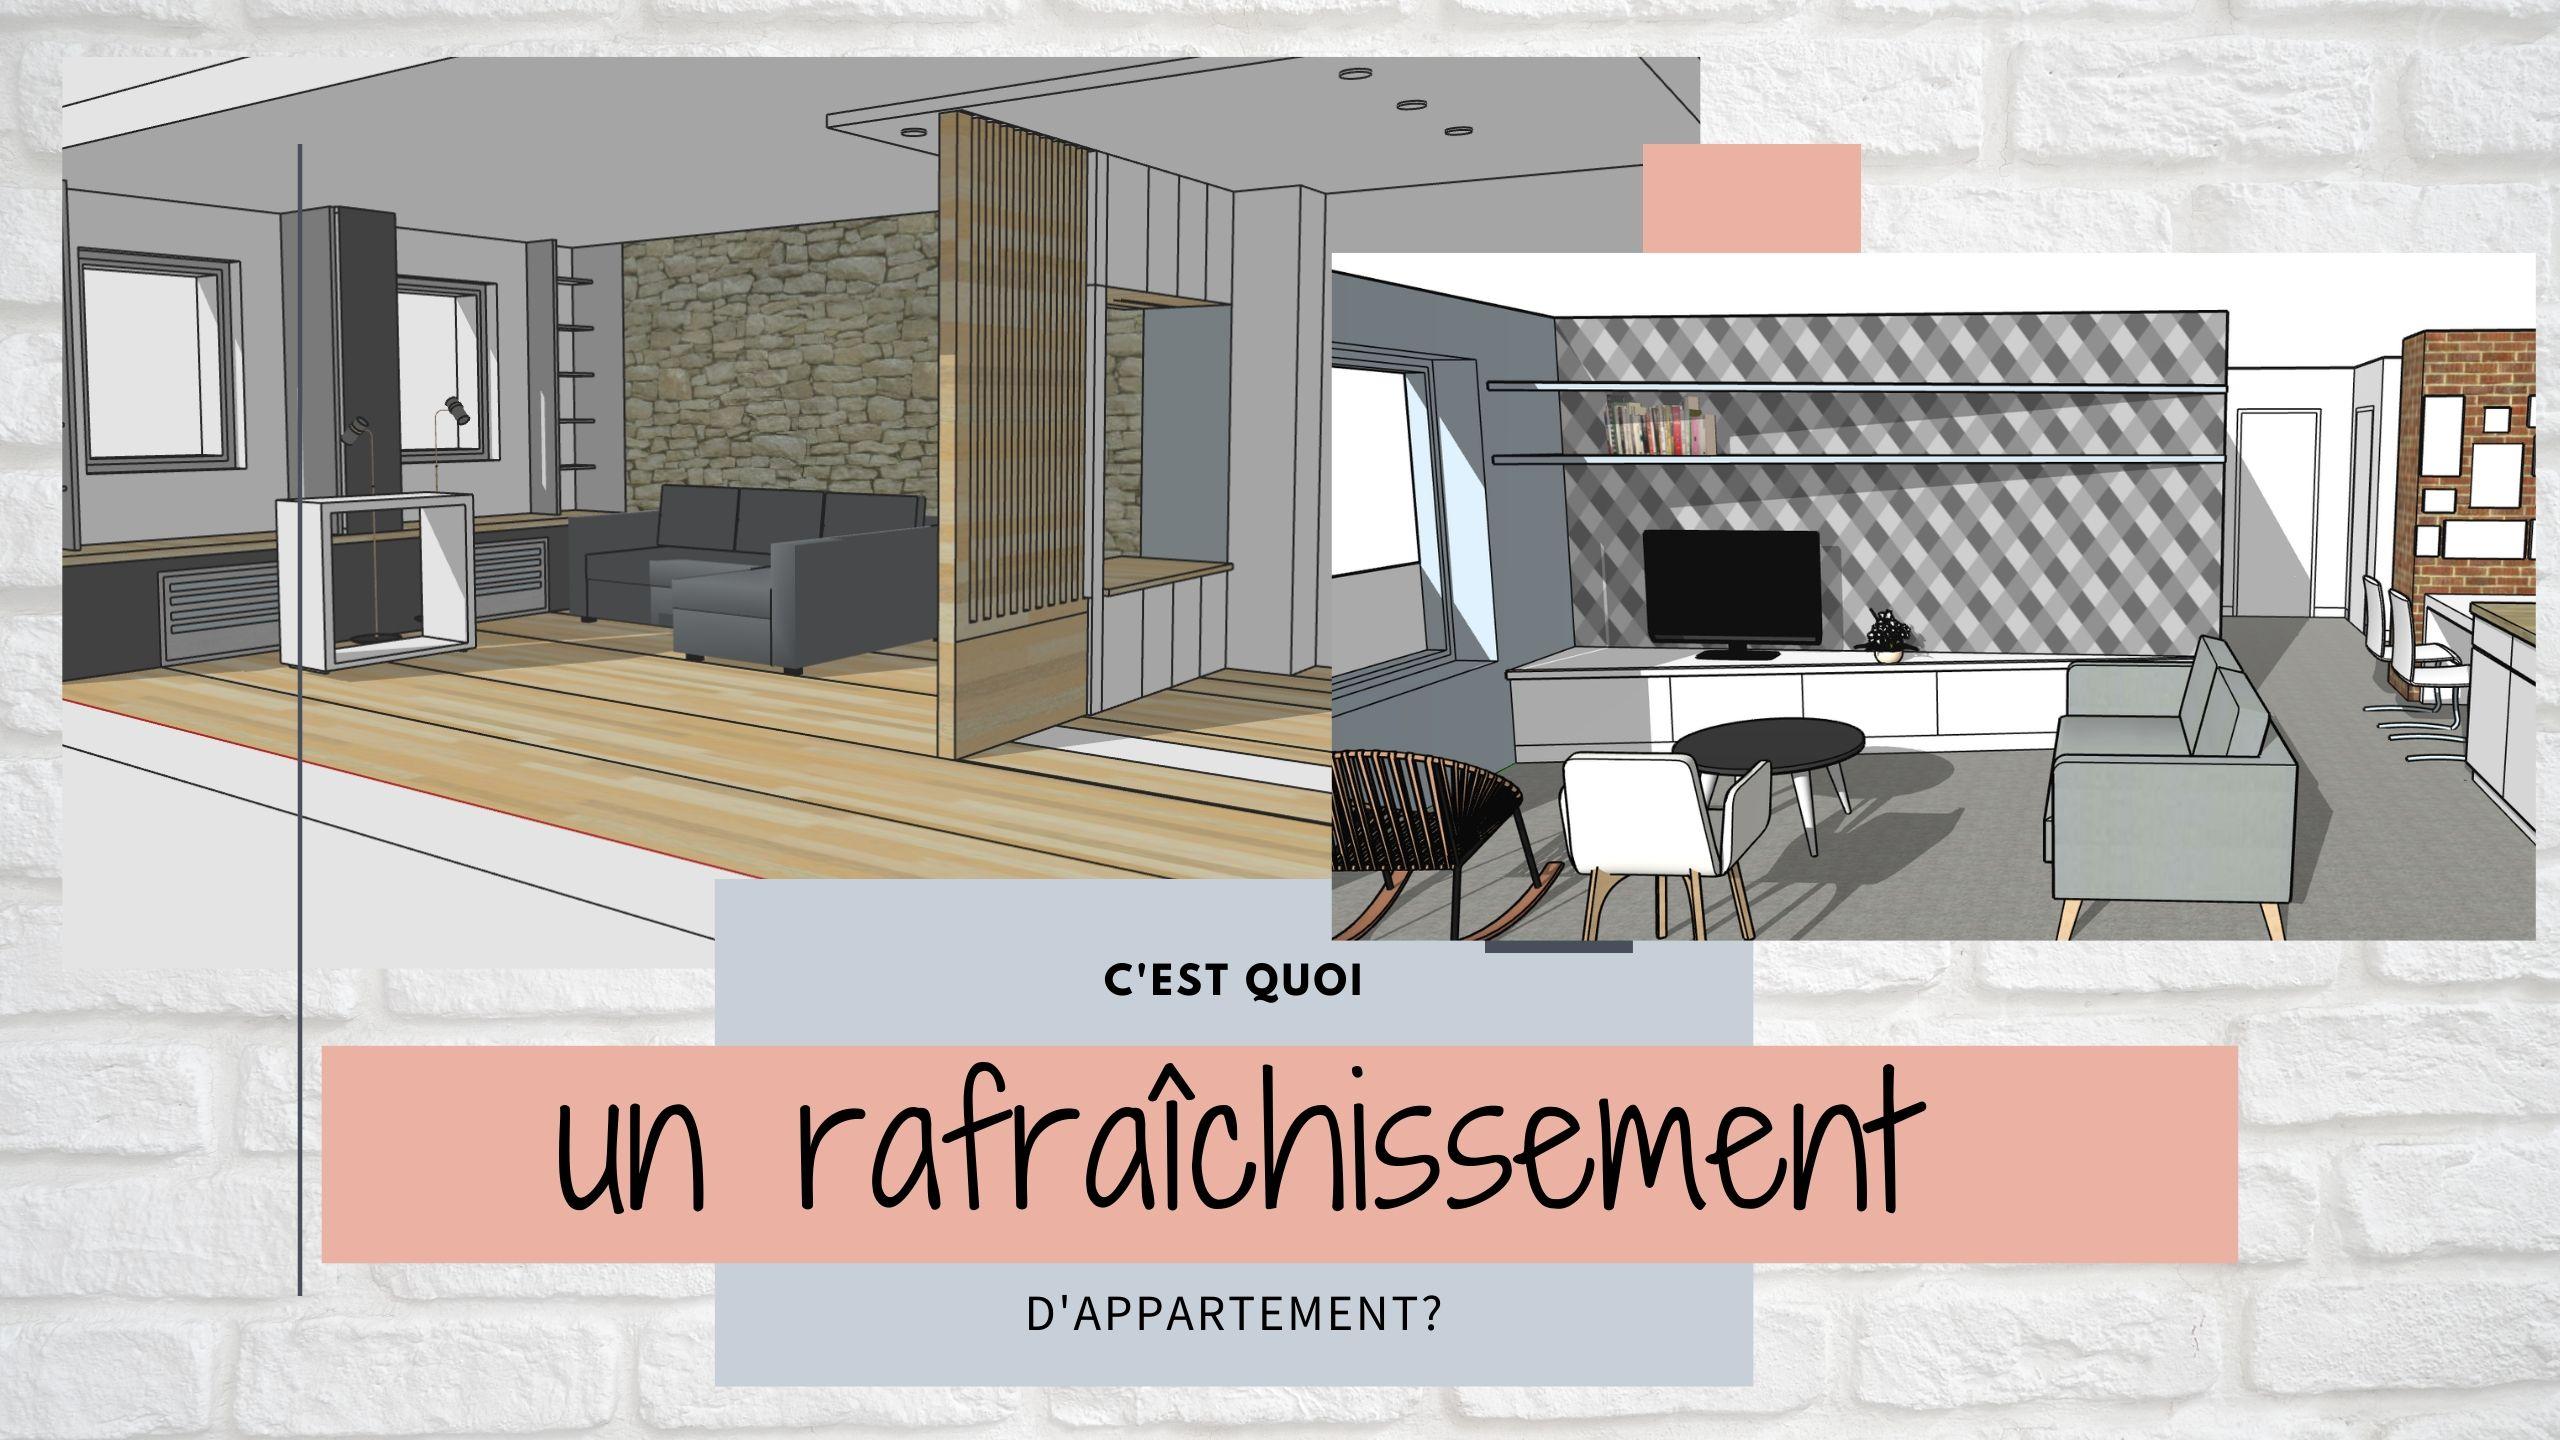 coût rénovation appartement 80m2 rafraichissement